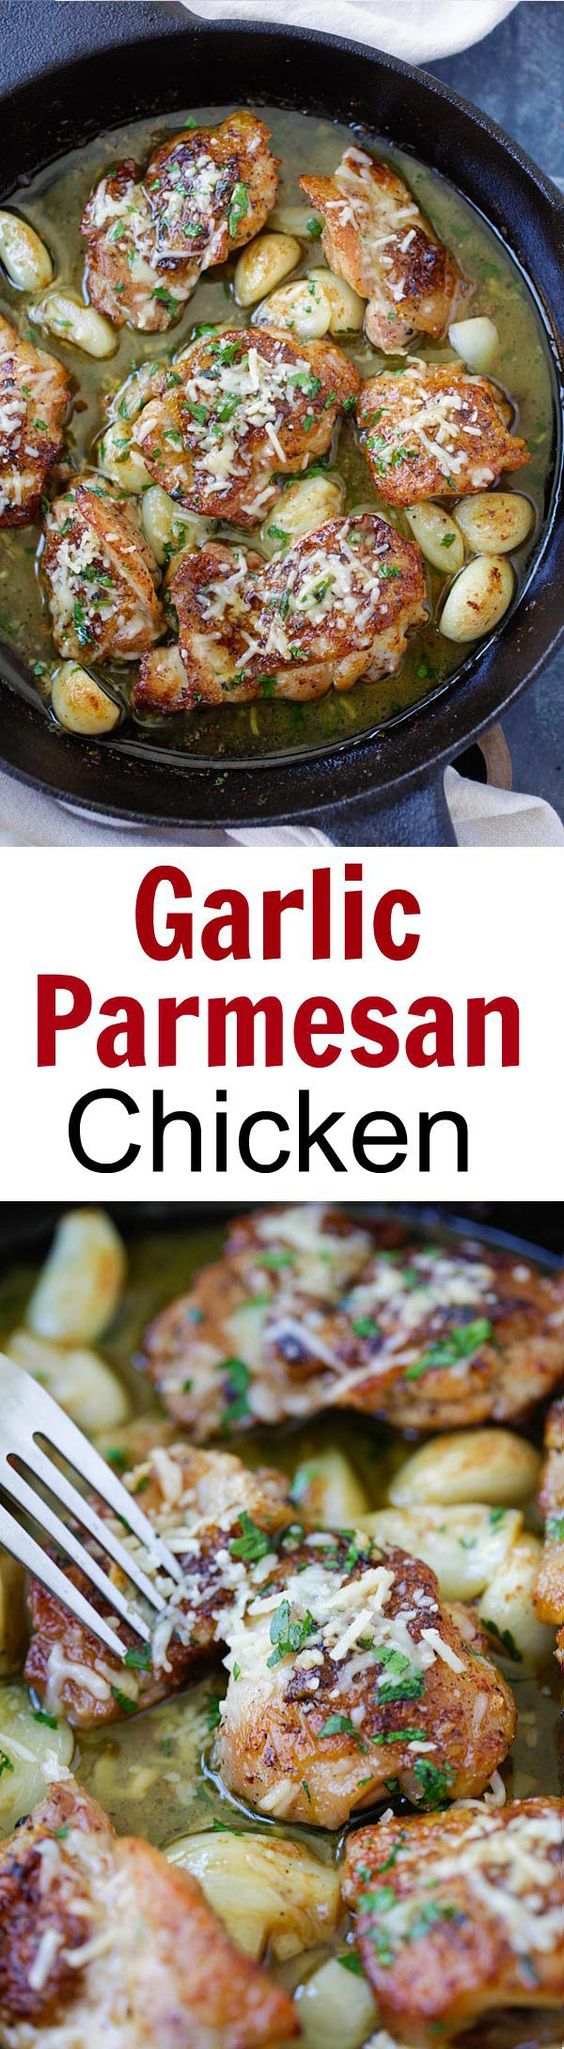 Garlic Parmesan Chicken | Recipe | Garlic Parmesan Chicken, Parmesan ...